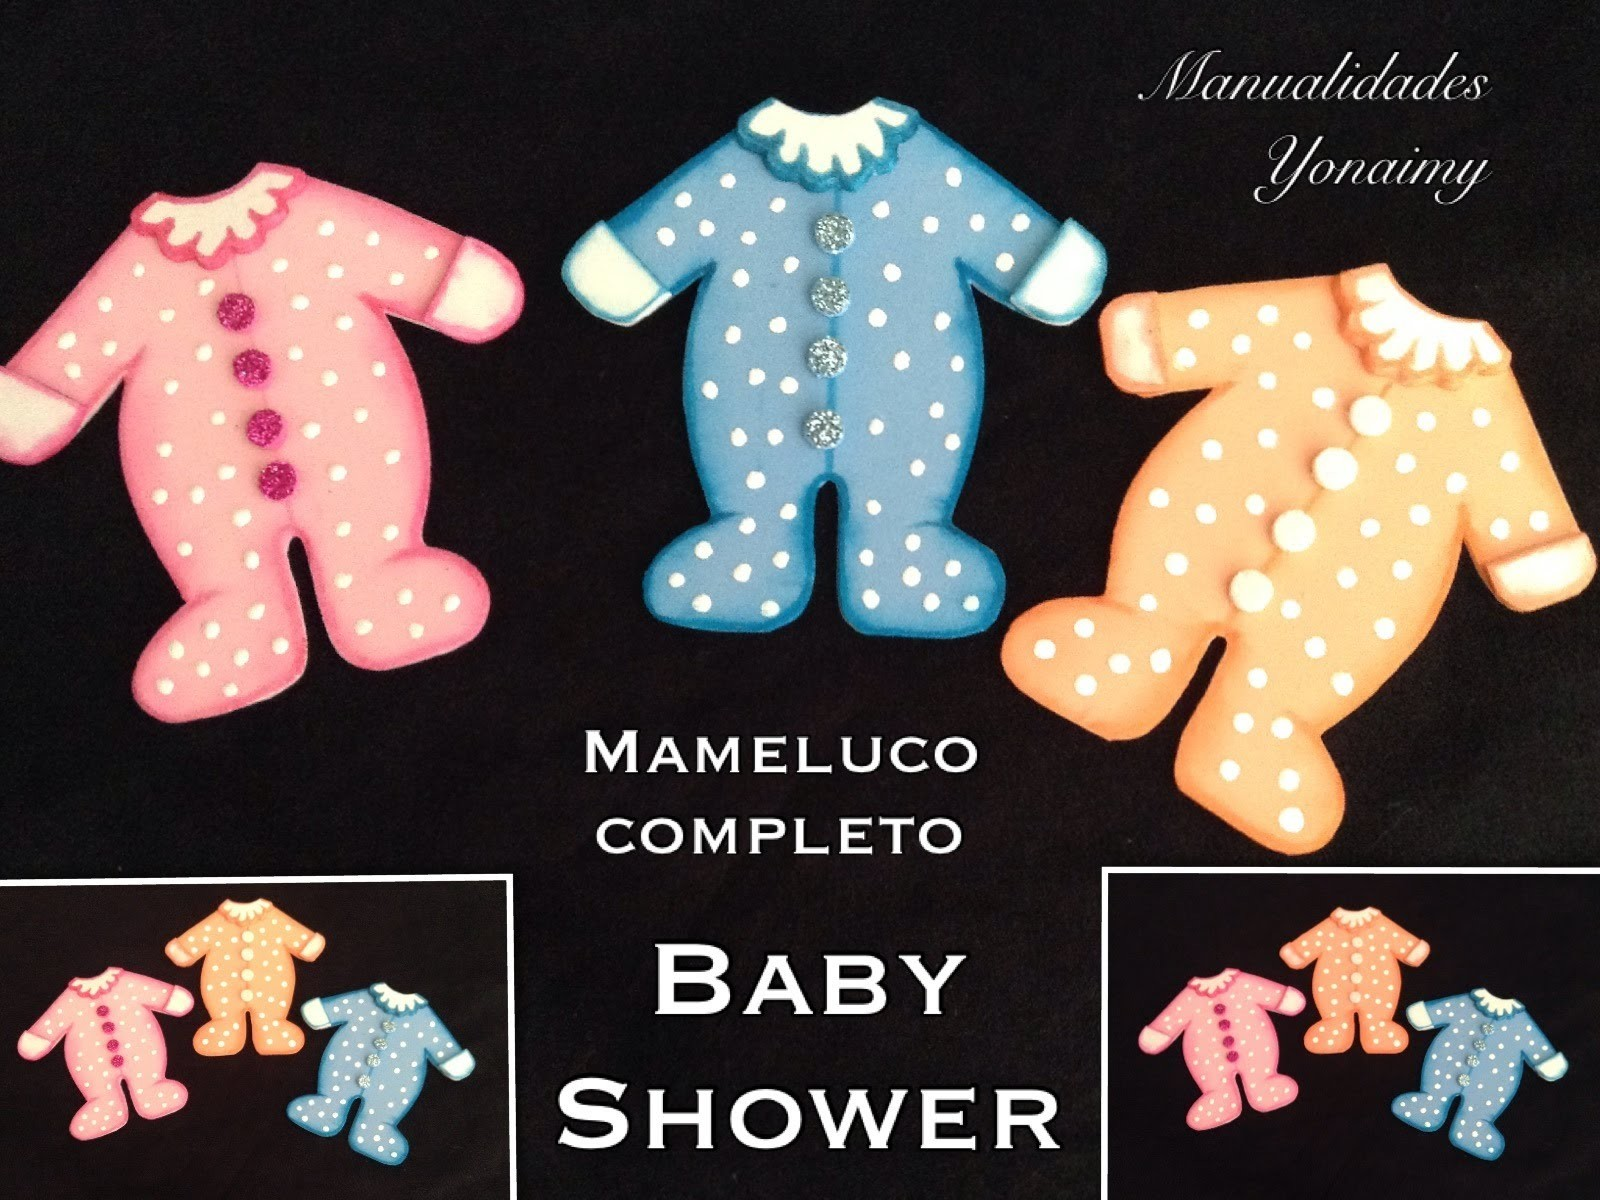 MAMELUCO COMPLETO PARA BABY SHOWER HECHO CON FOAMY O GOMA EVA .